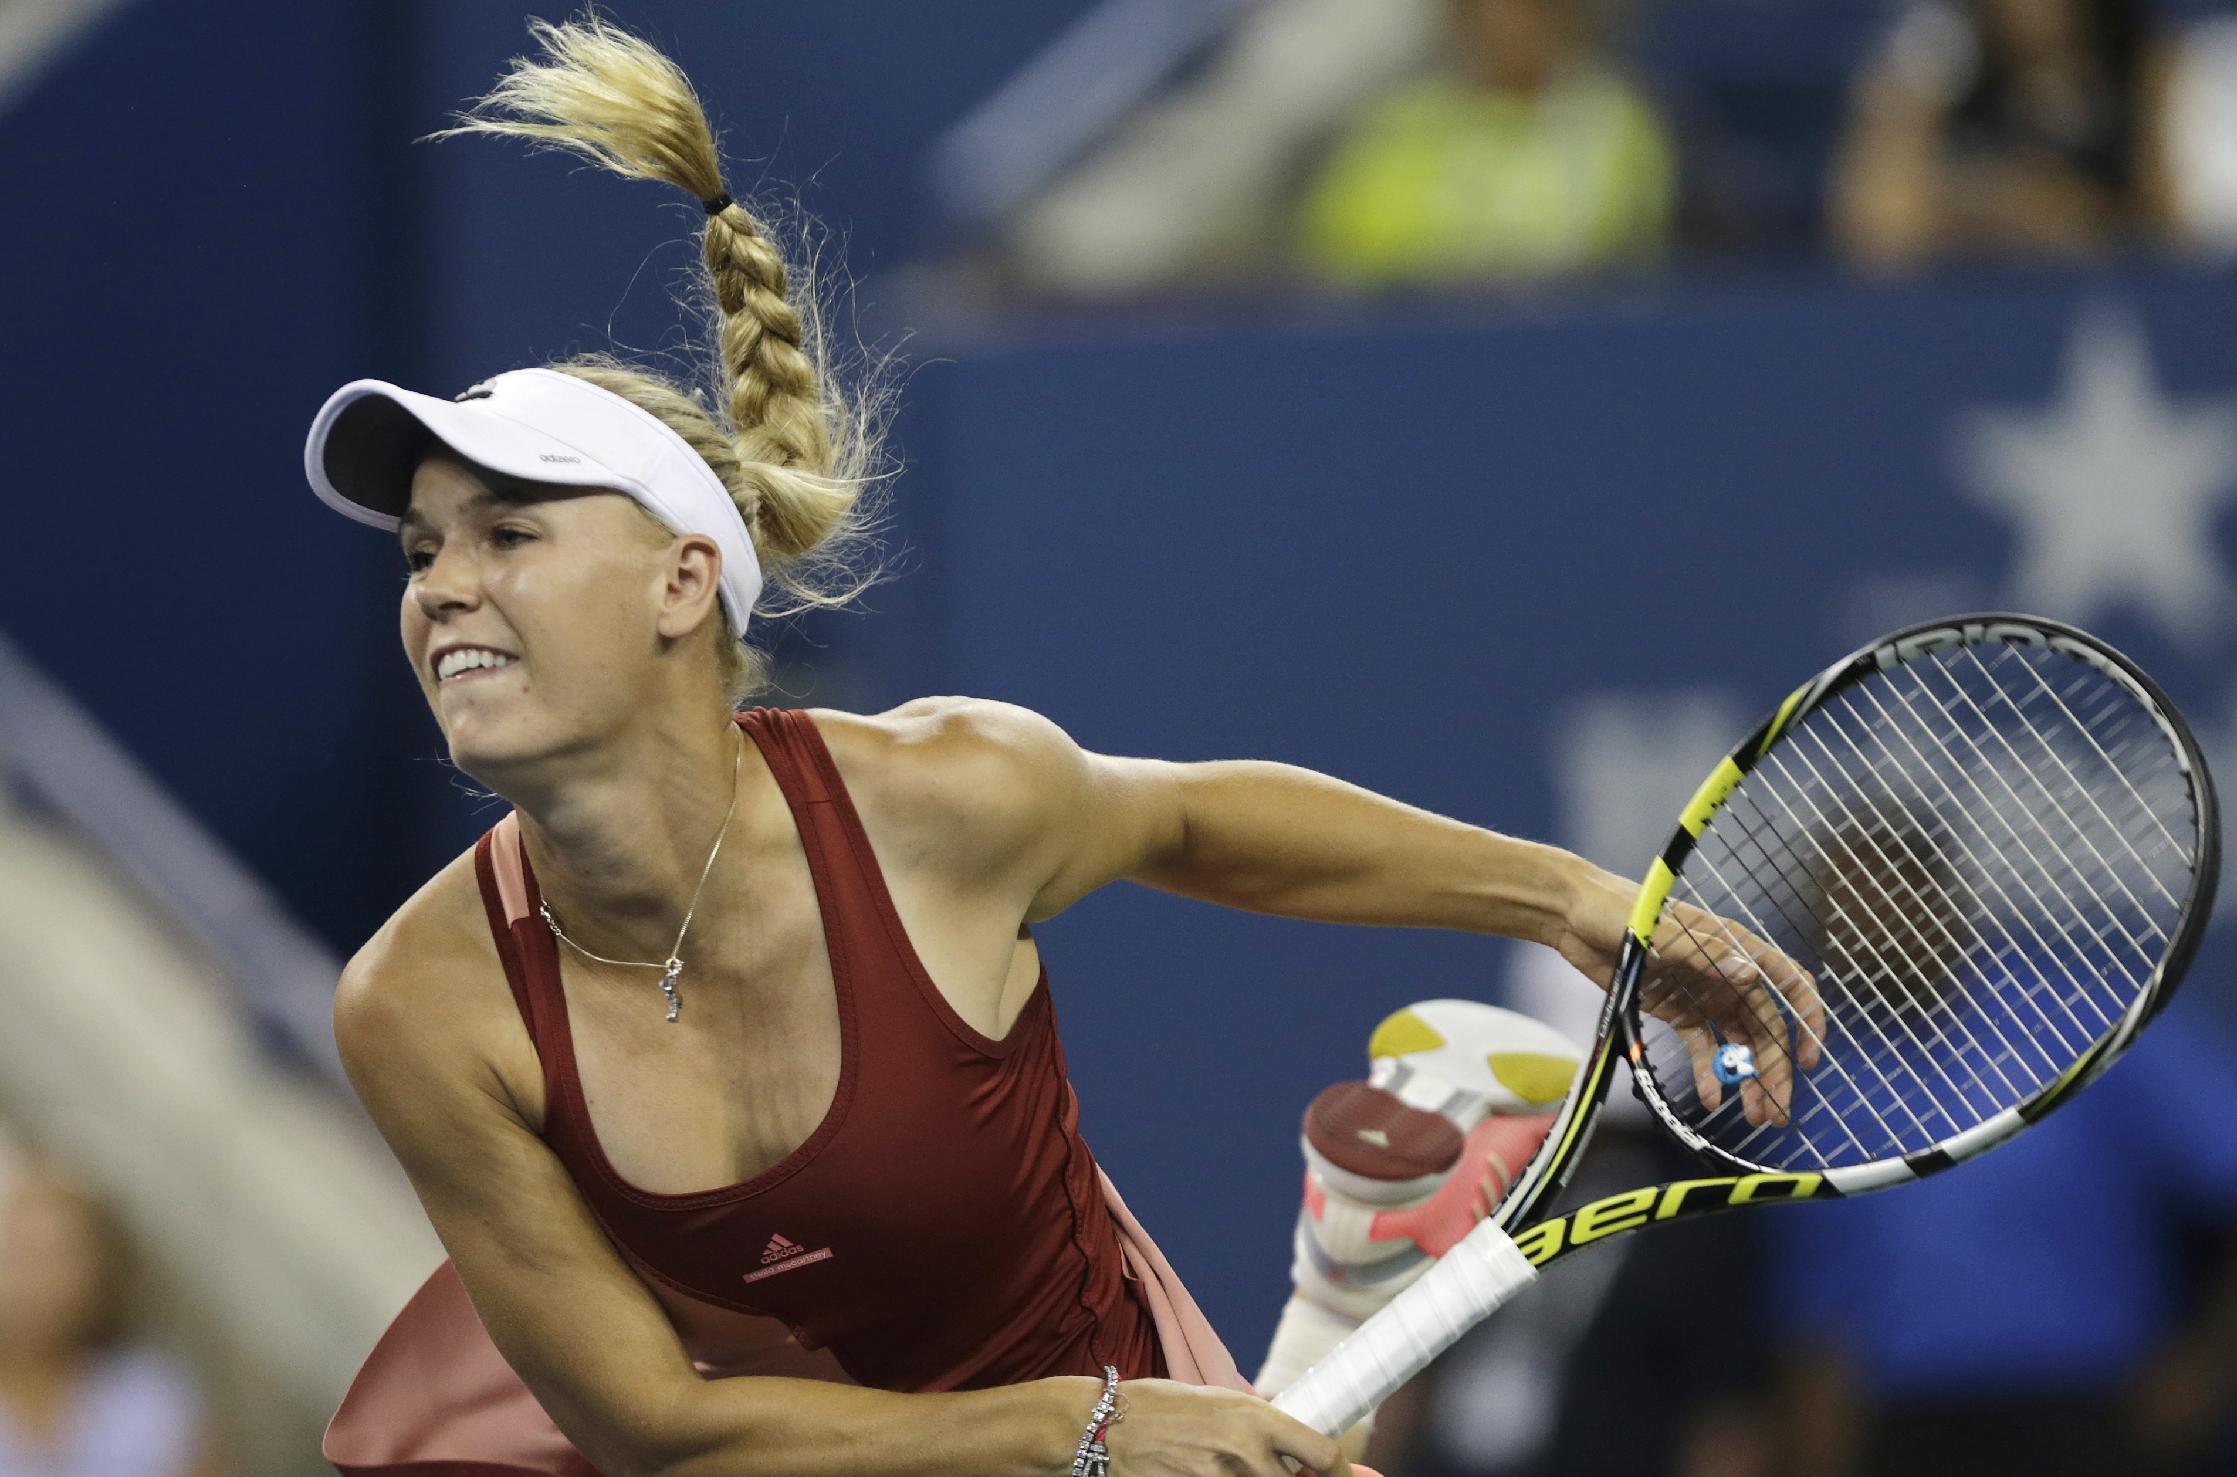 Perfect returns help Wozniacki return to Slam semi